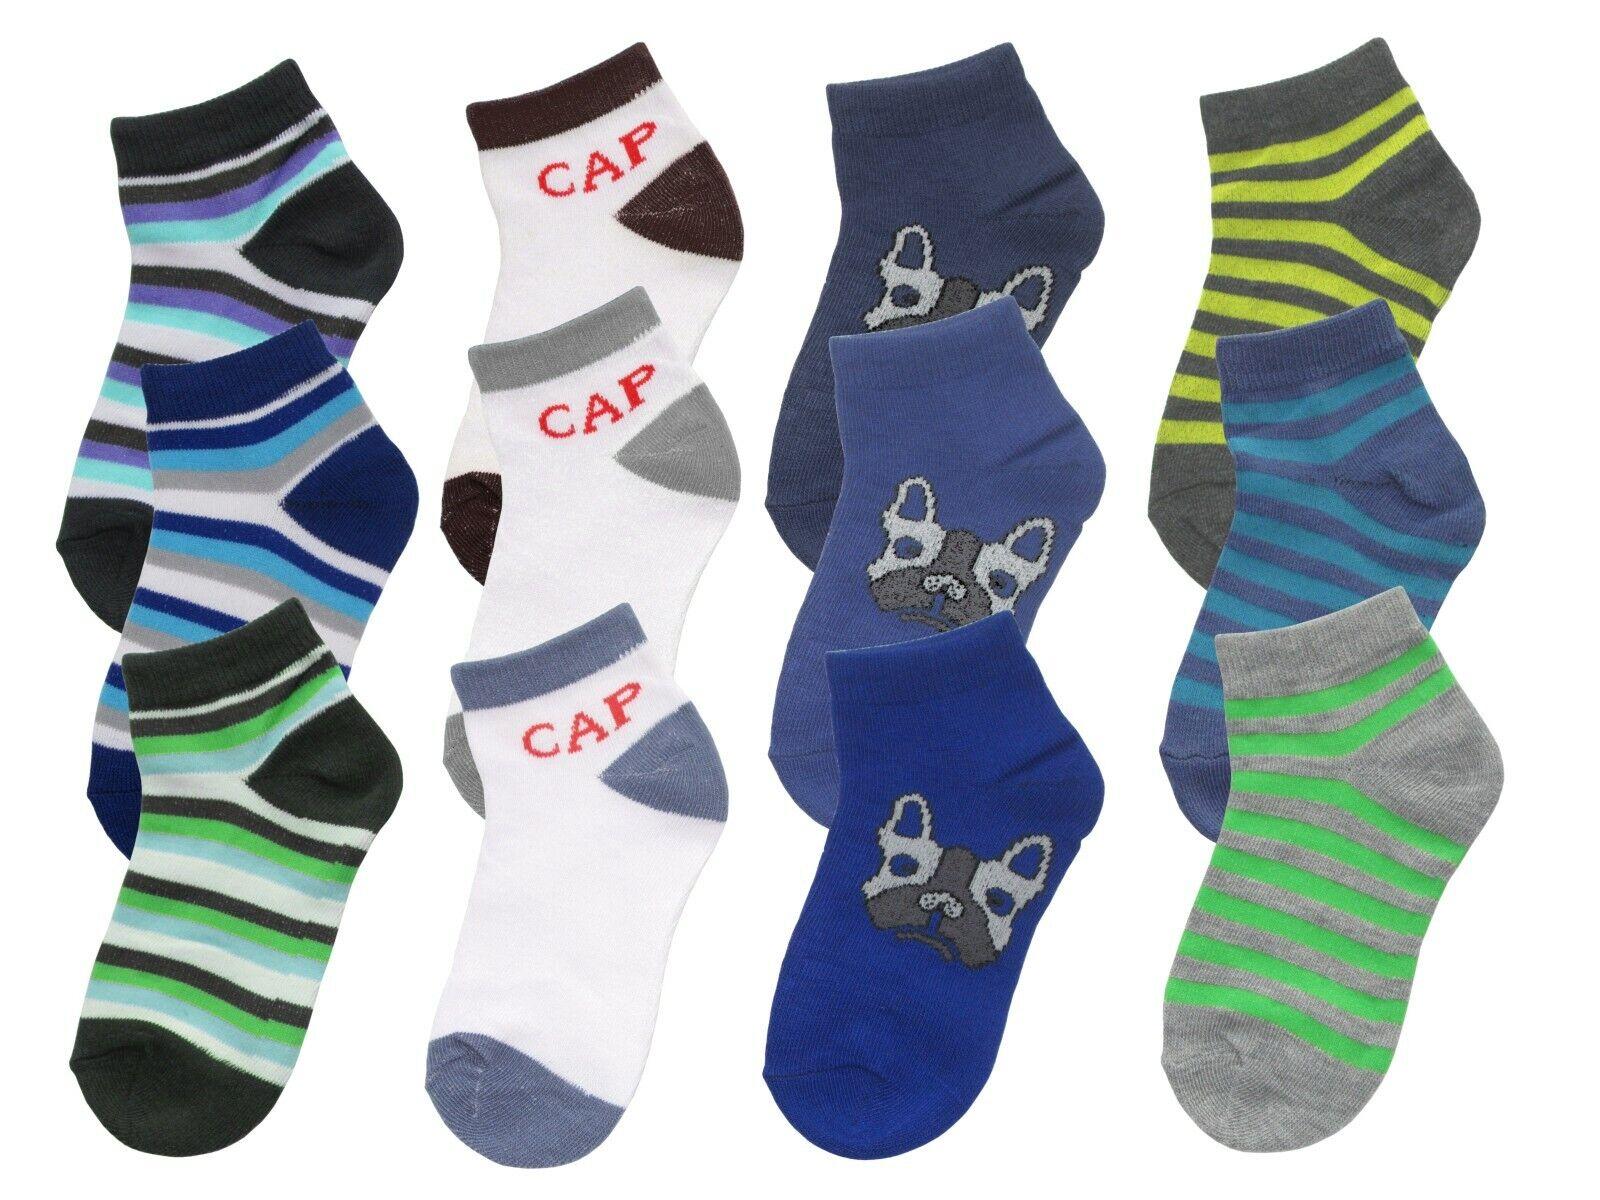 12 24 36 Paar Gr. 23-38 Jungen Sneakersocken Socken Sommer Kindersocken D5